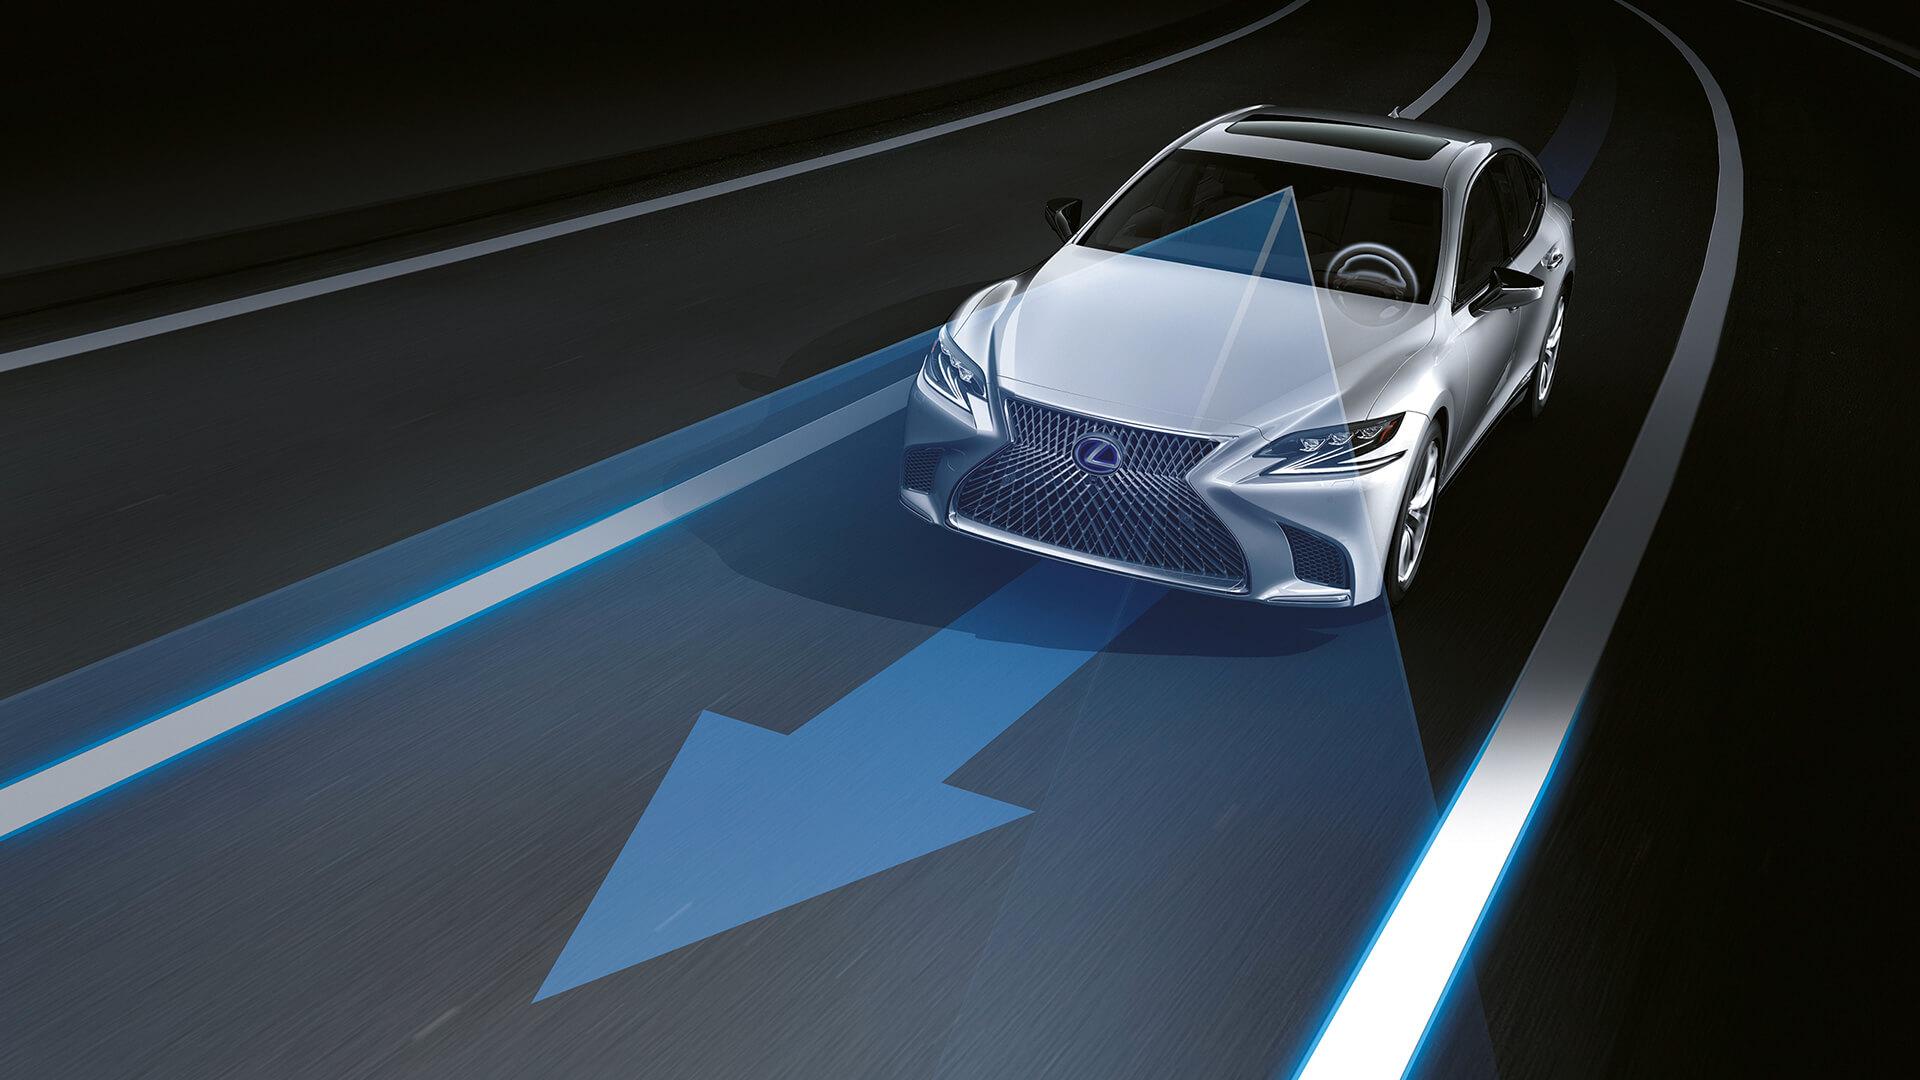 2018 lexus ls features advanced lane keeping assist